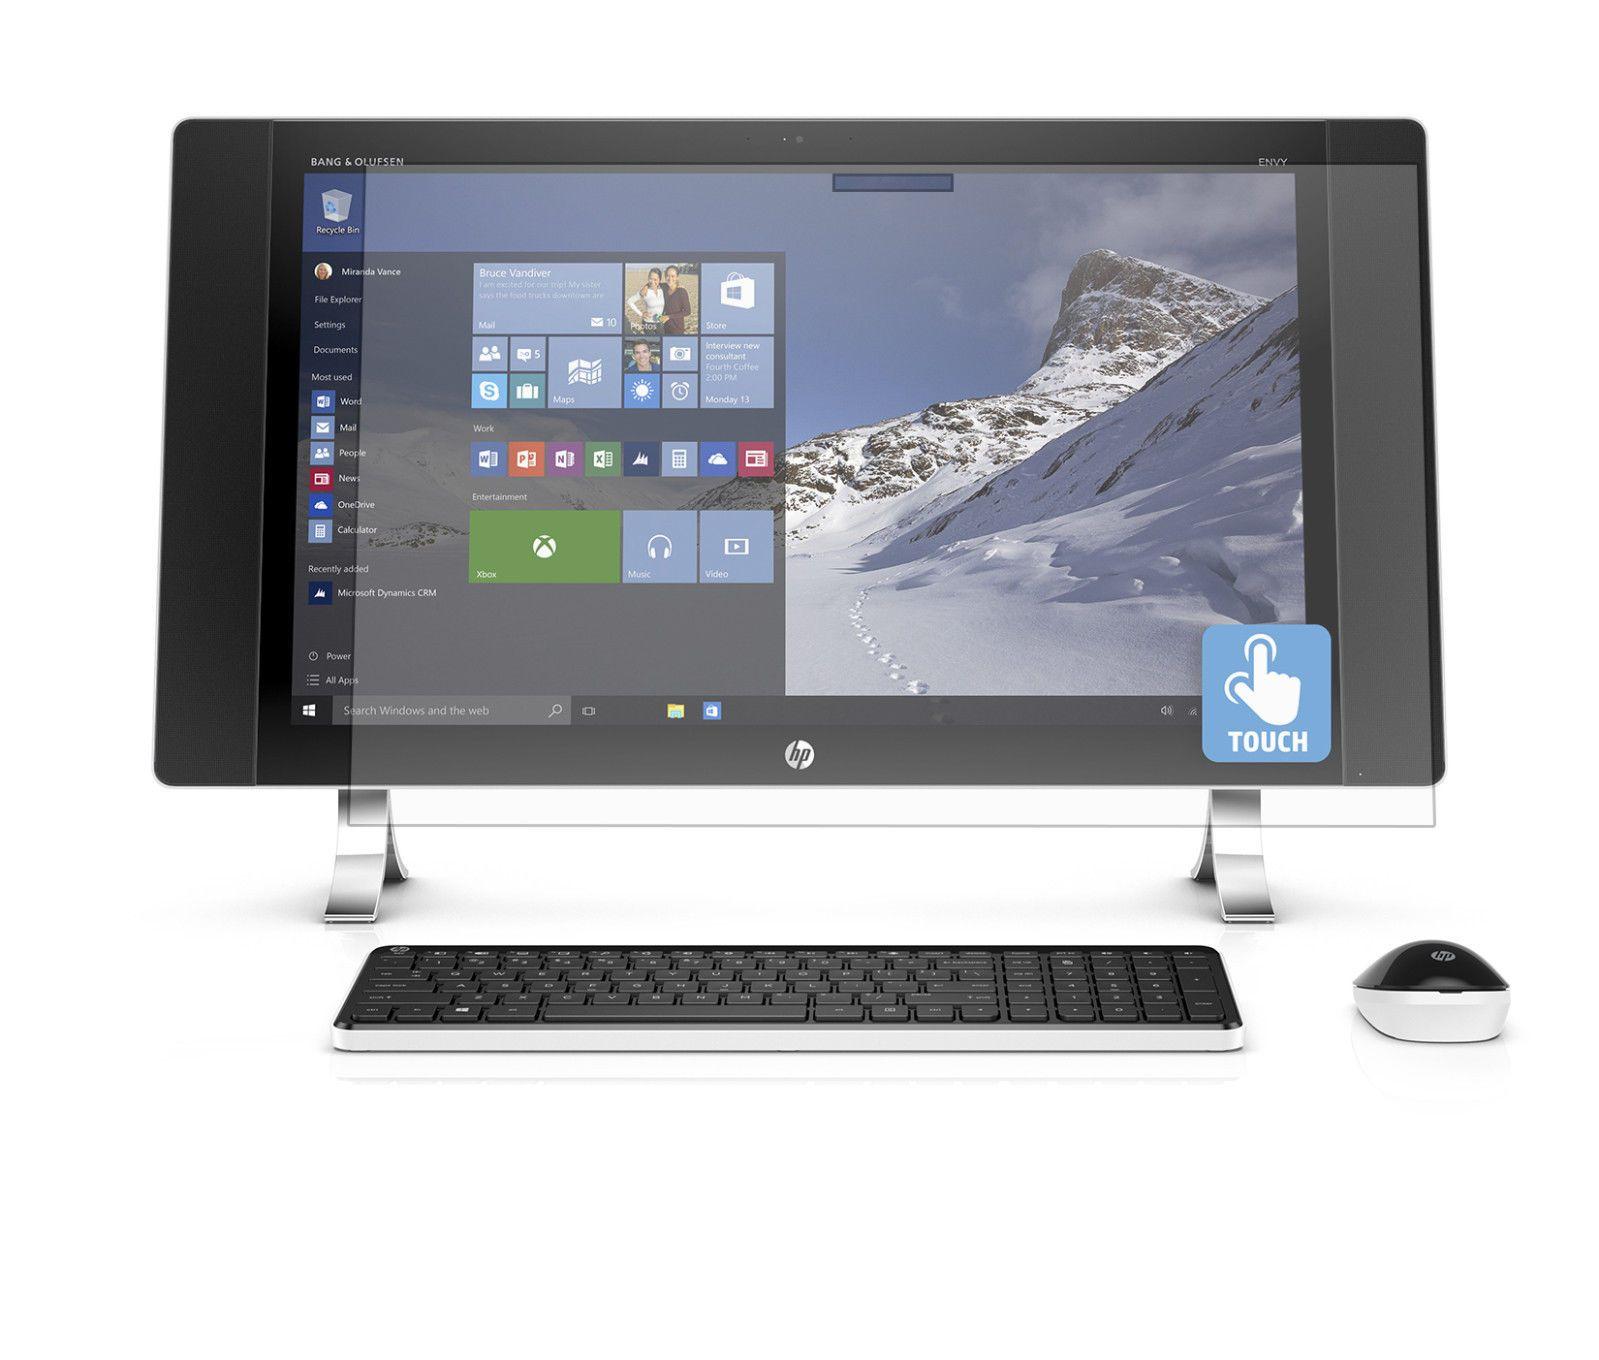 "HP ENVY 24 n025 23 8"" 4K UHD 3840 x 2160 Touch Screen All In e Intel Core i5 8GB Memory 1TB SSHD UHD Touch AMD R9 A375 4G DGPU Win 10"